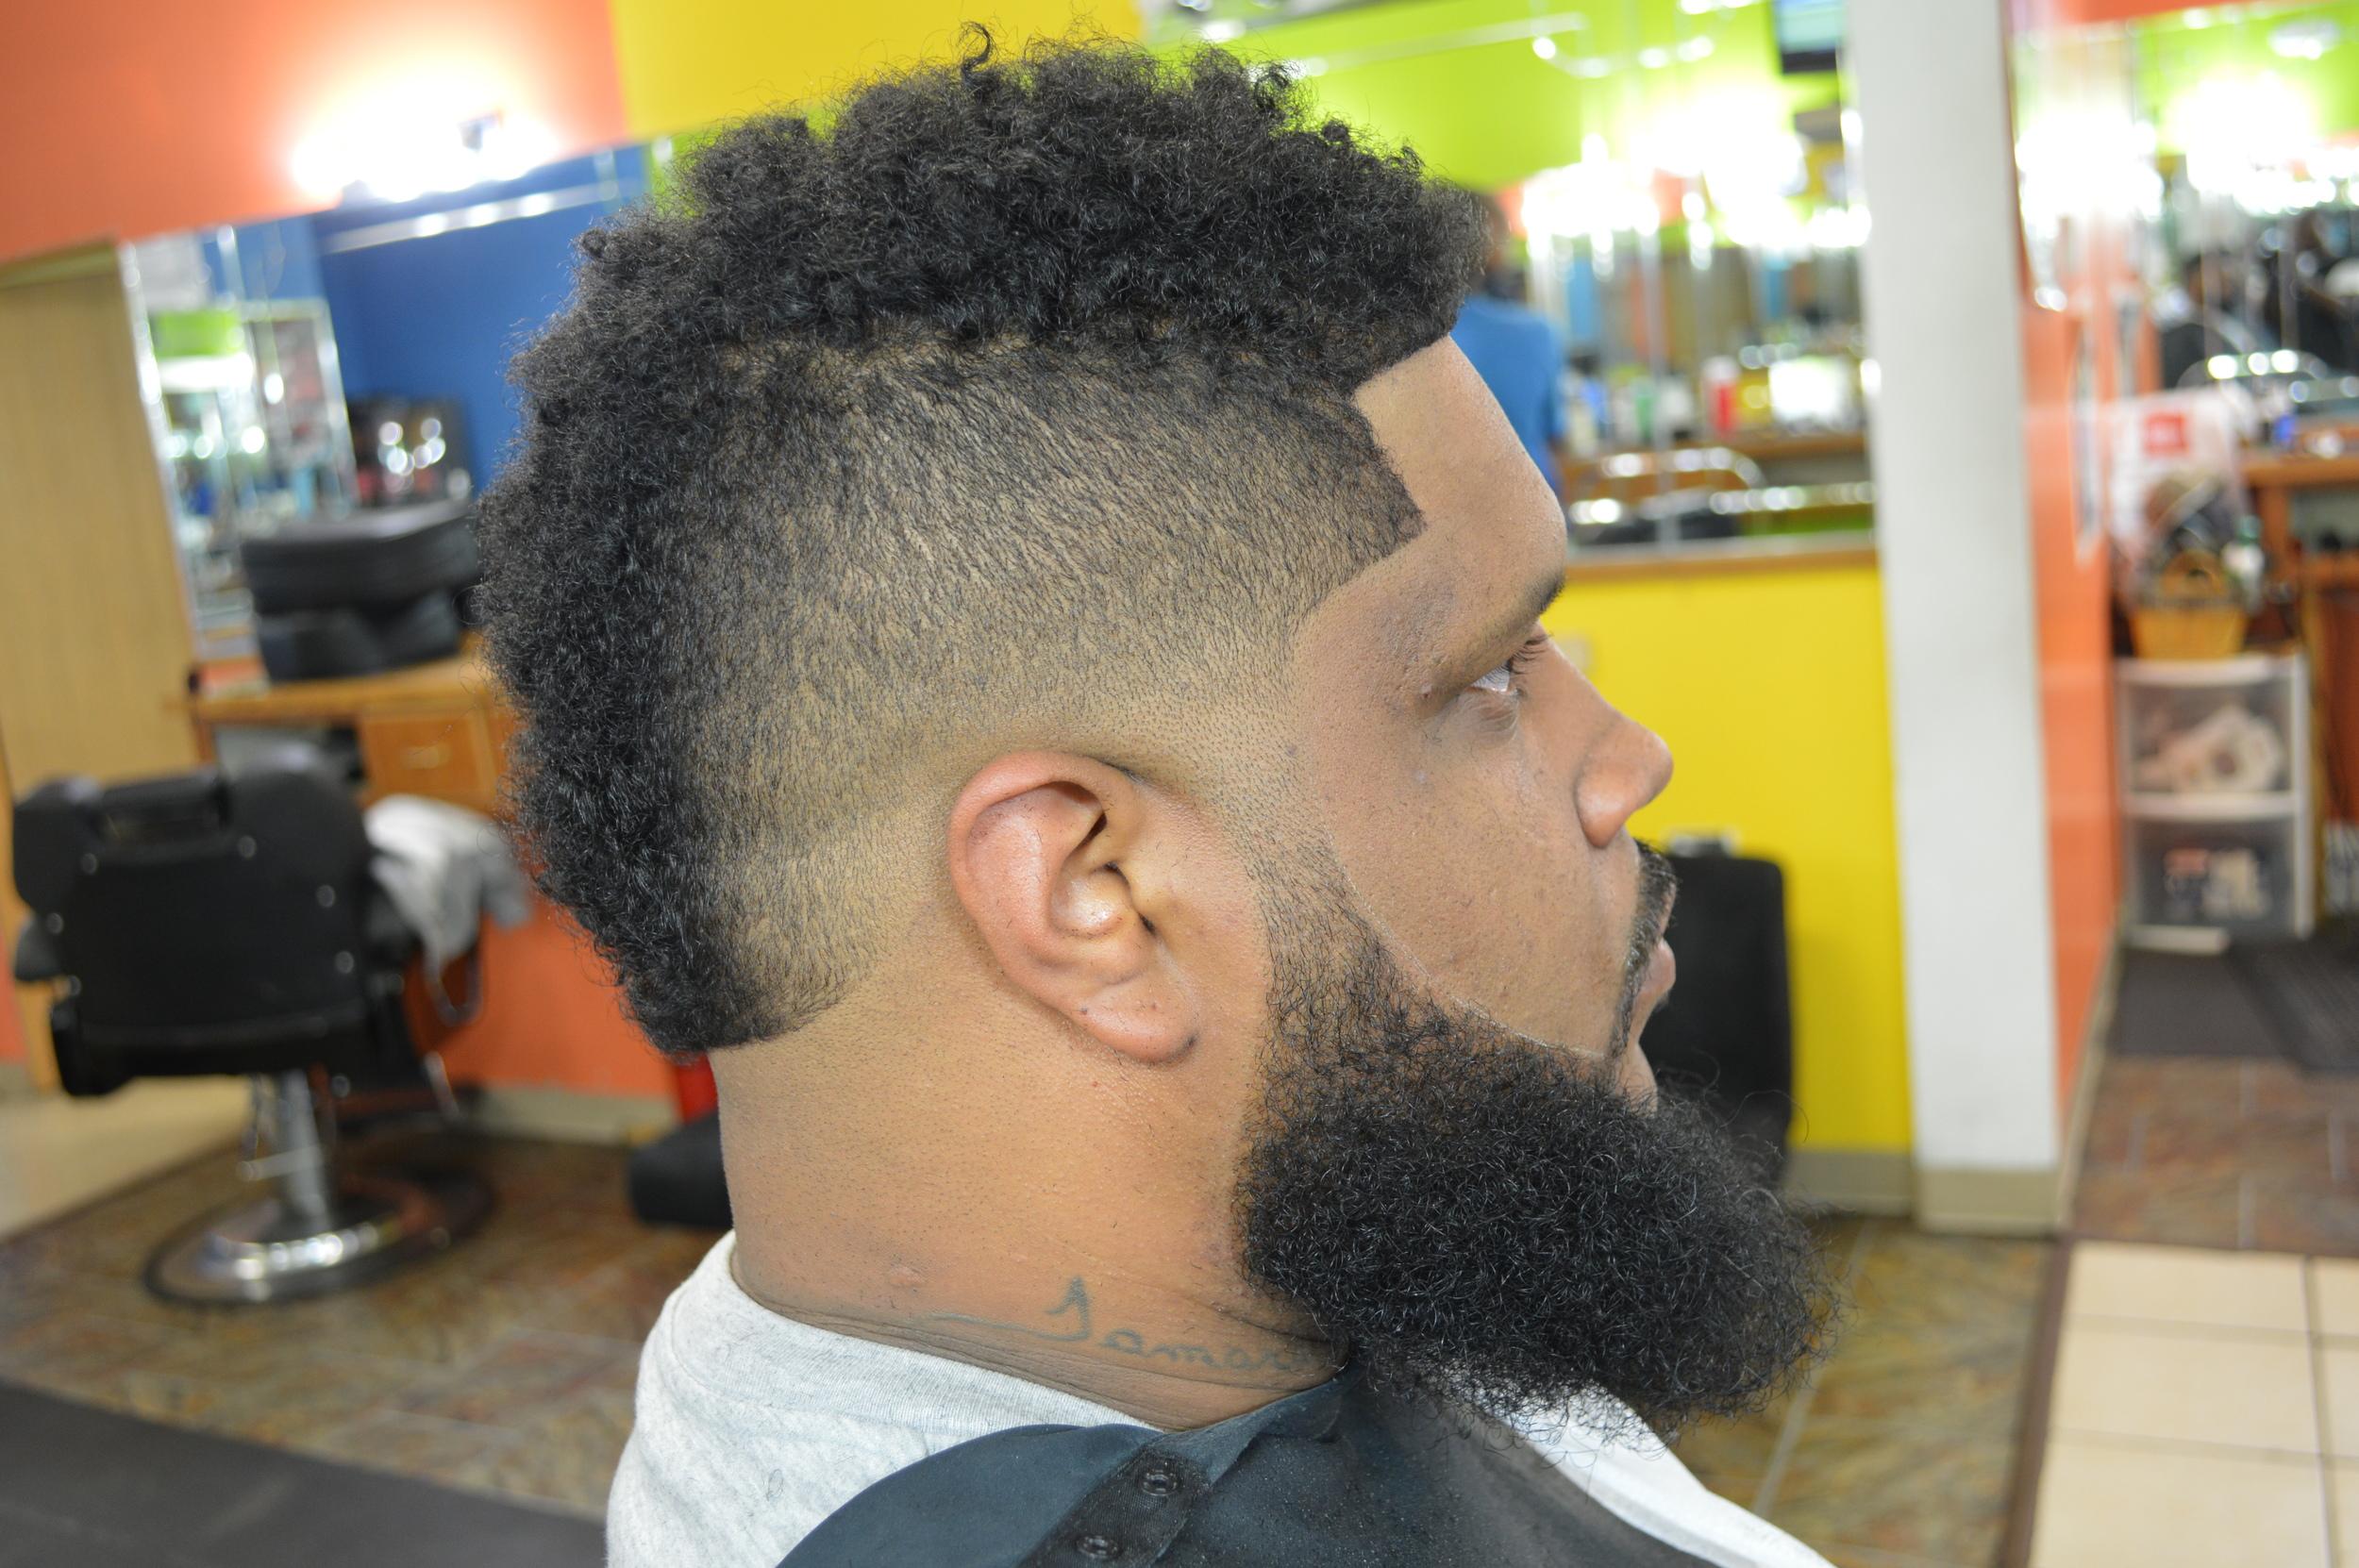 Profile mohawk beard.JPG